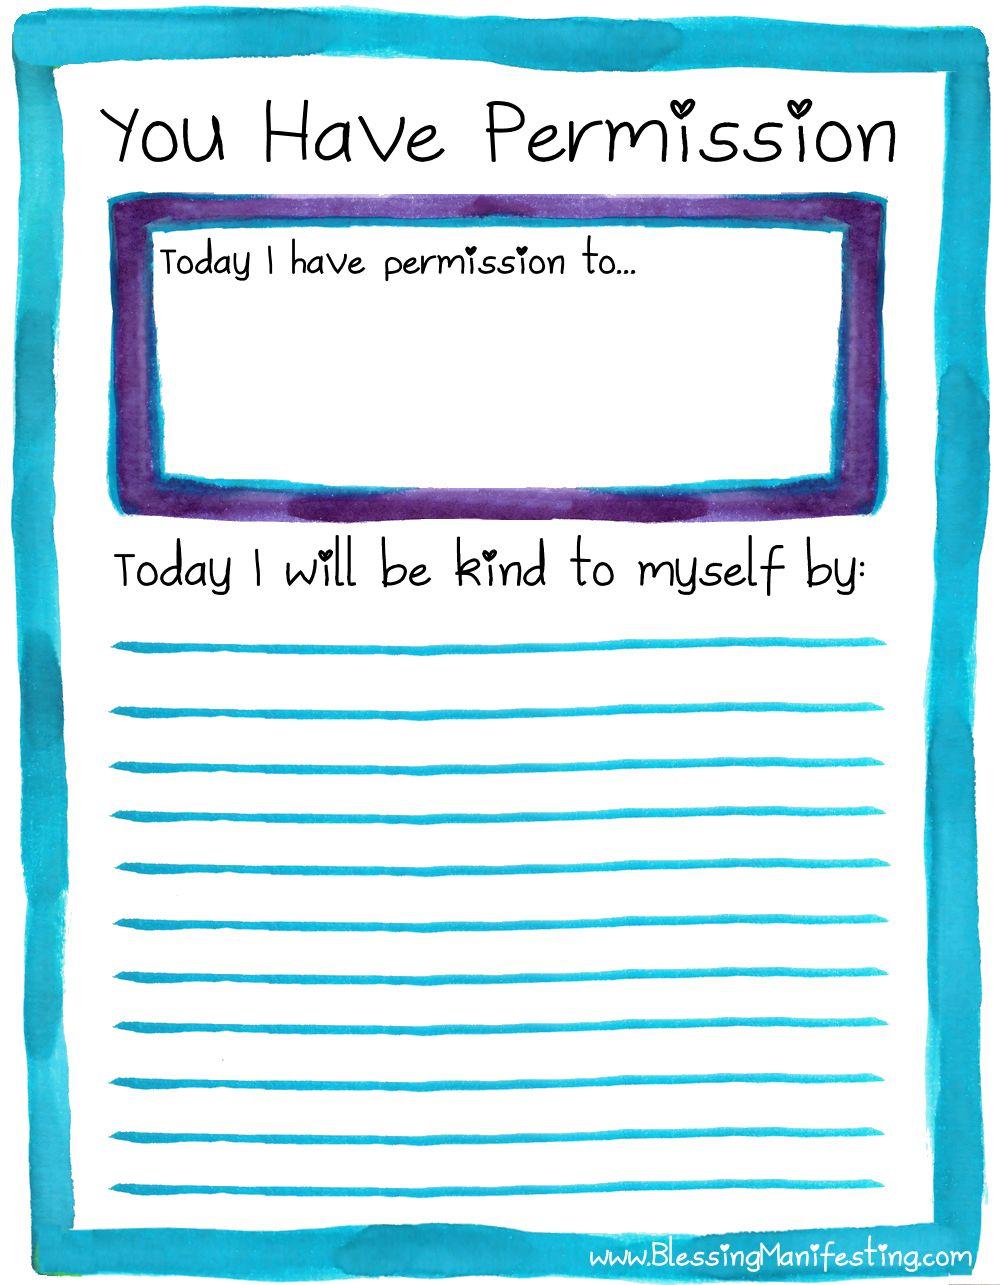 Permission Slip For Self Care Self Care Mental Health